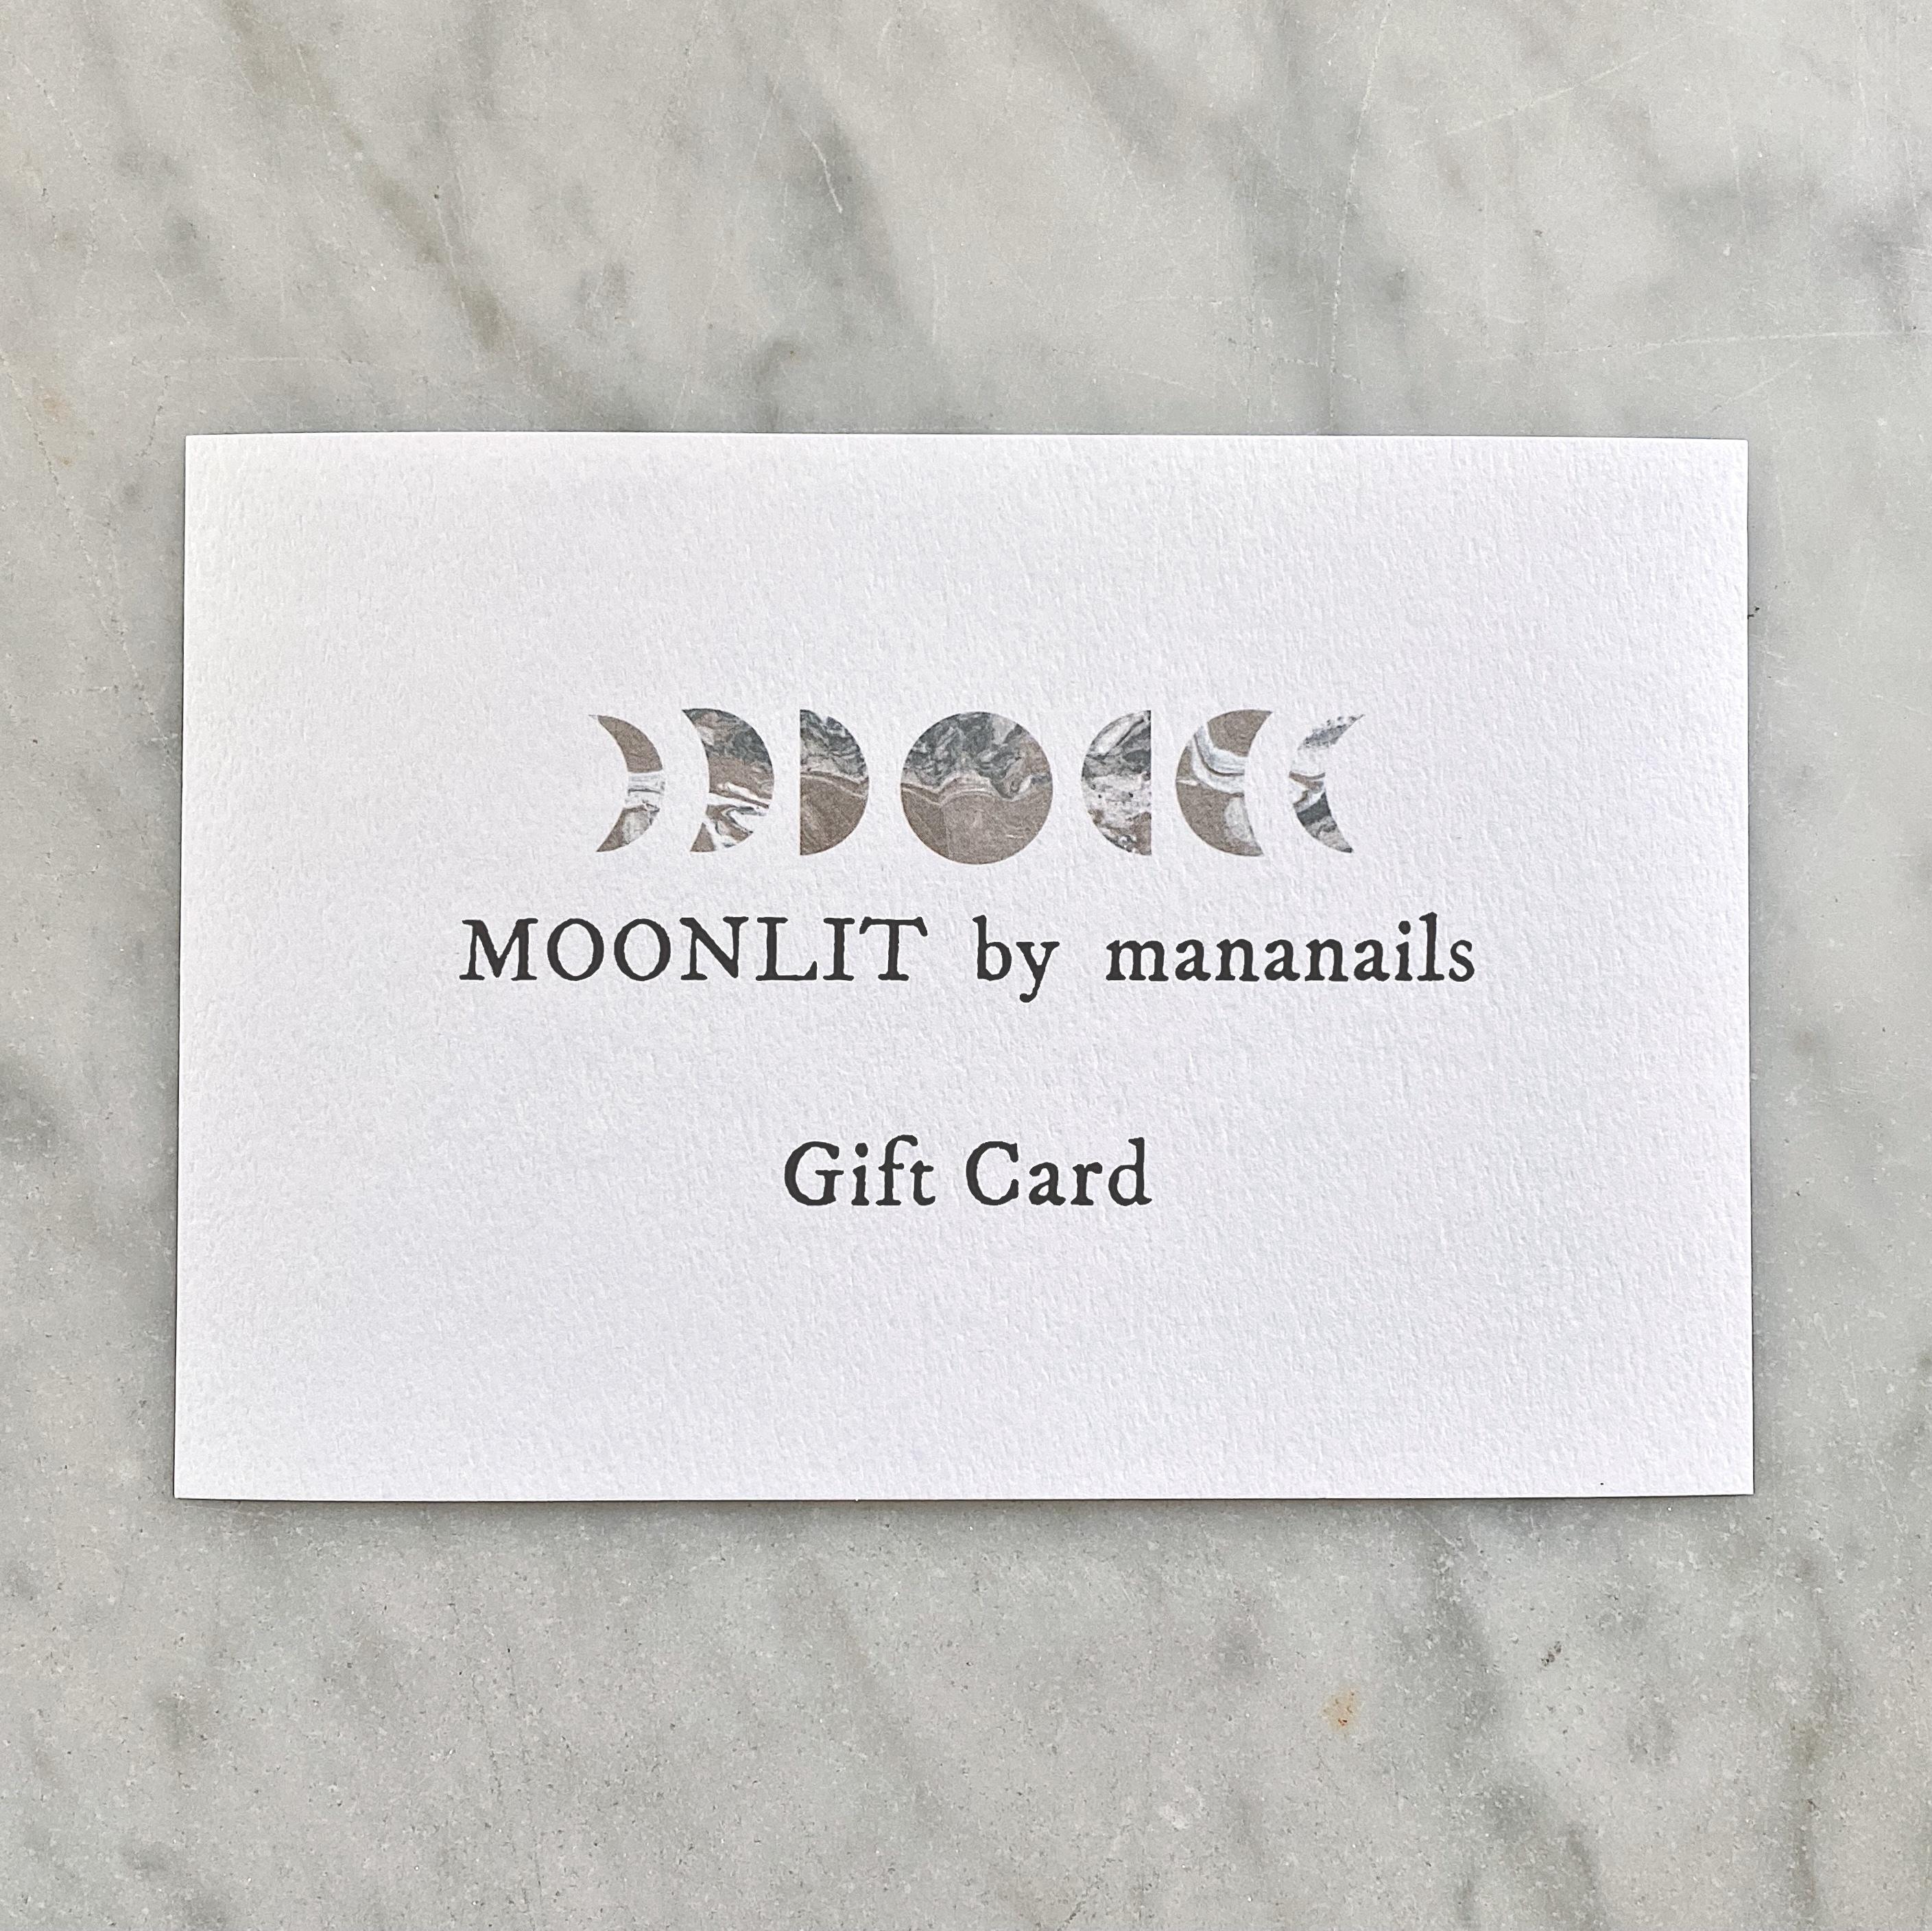 MOONLIT Gift Card (担当:manami)